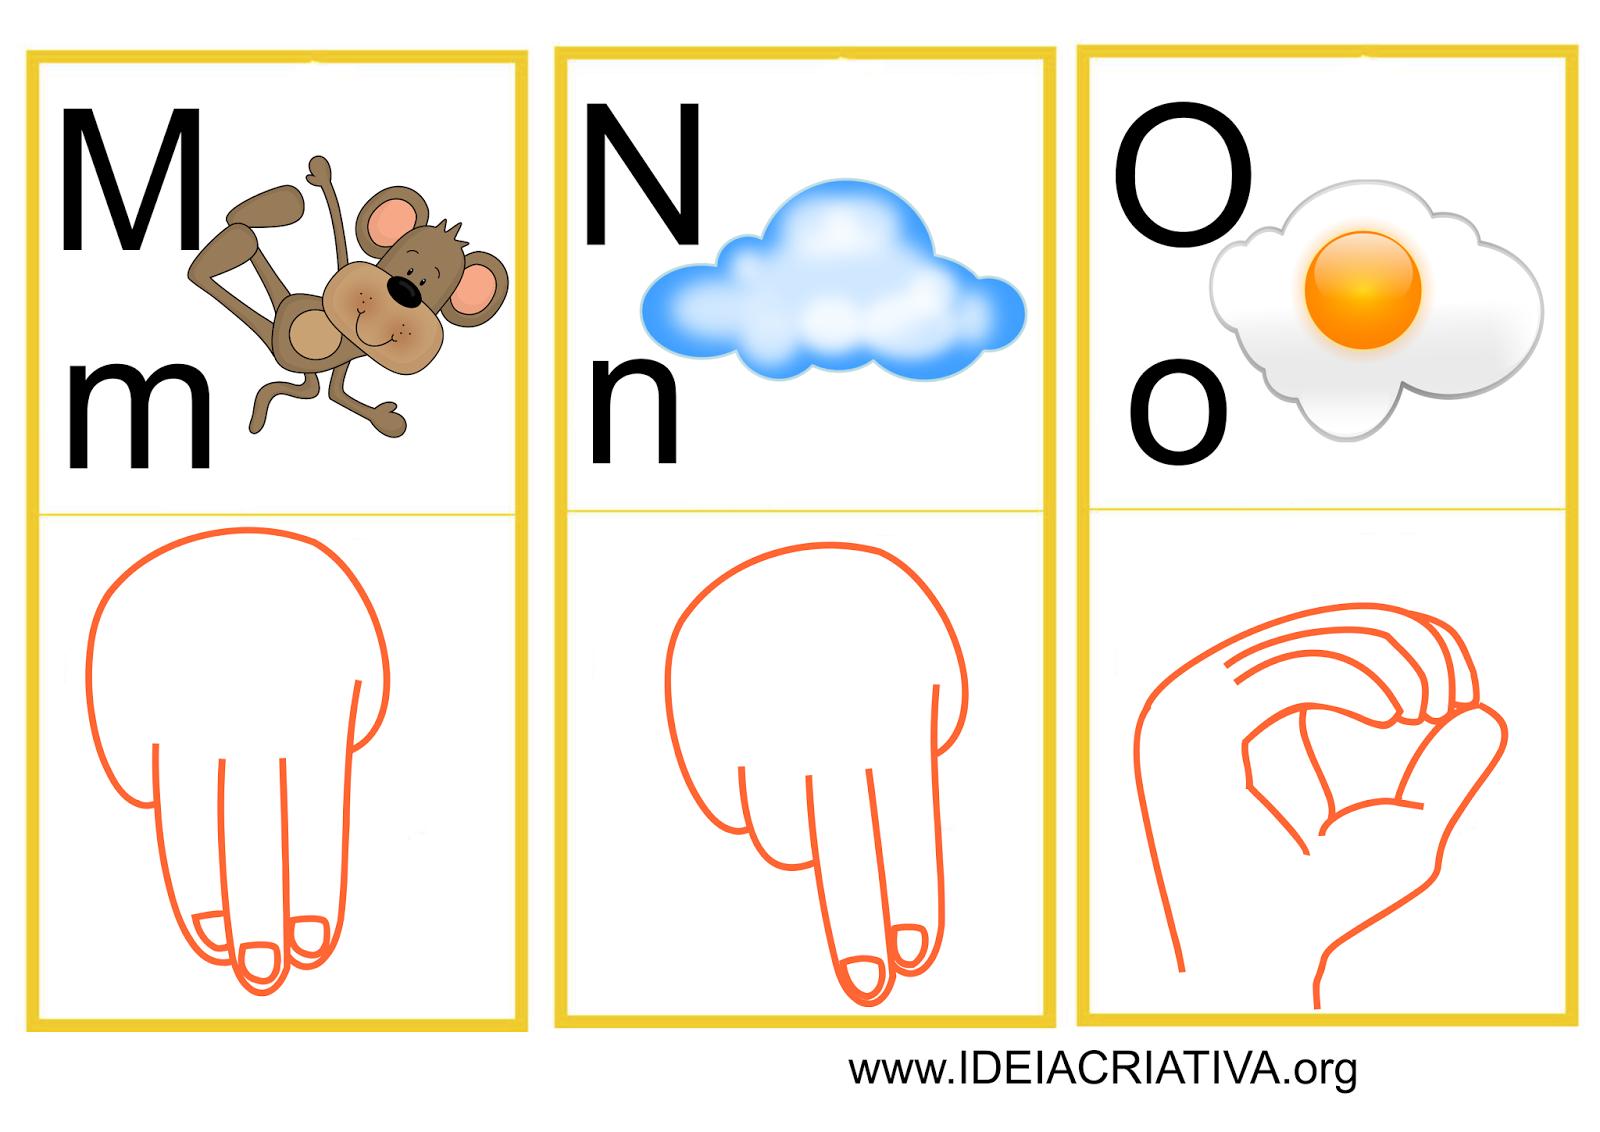 LIBRAS: UMA LÍNGUA QUE SE VÊ.: Flash Cards Letras do Alfabeto Libras #CB4100 1600 1132